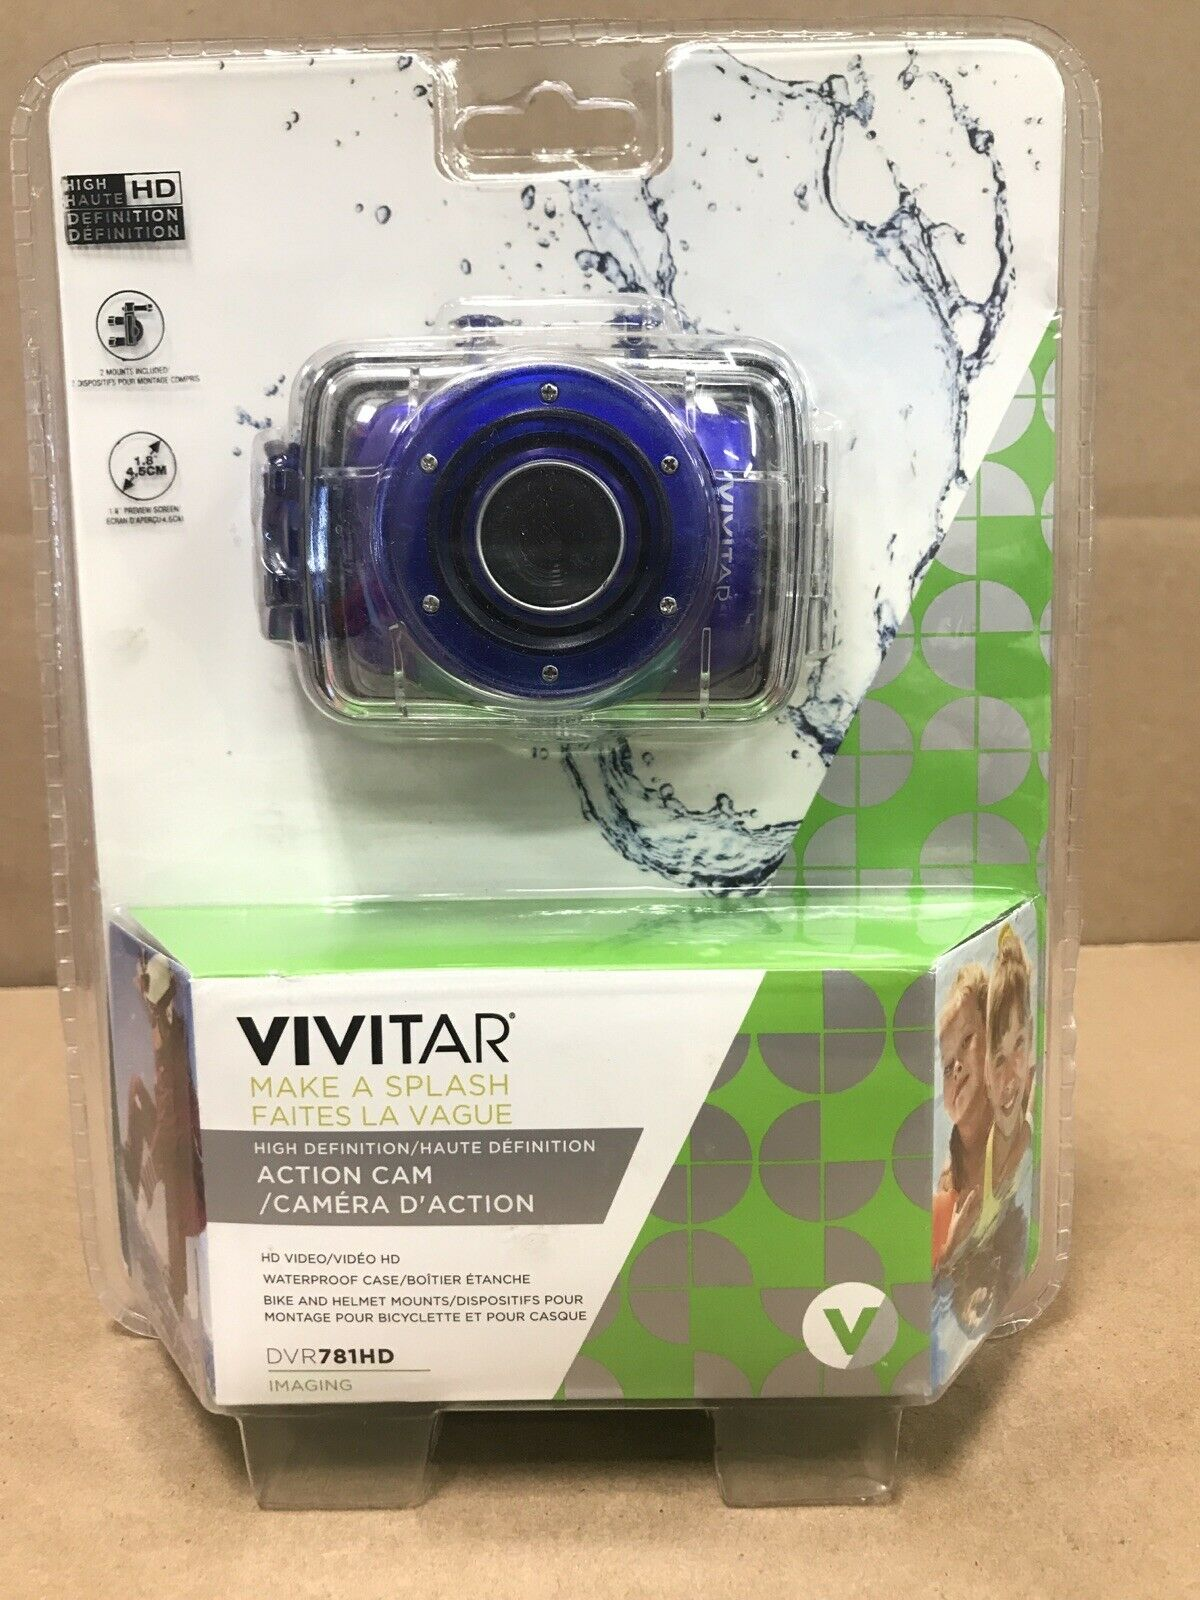 Vivitar Action Camera W/Waterproof Case Bike Mount Helmet Mount DVR783HD BLUE F5 action bike blue camera case dvr783hd helmet mount vivitar